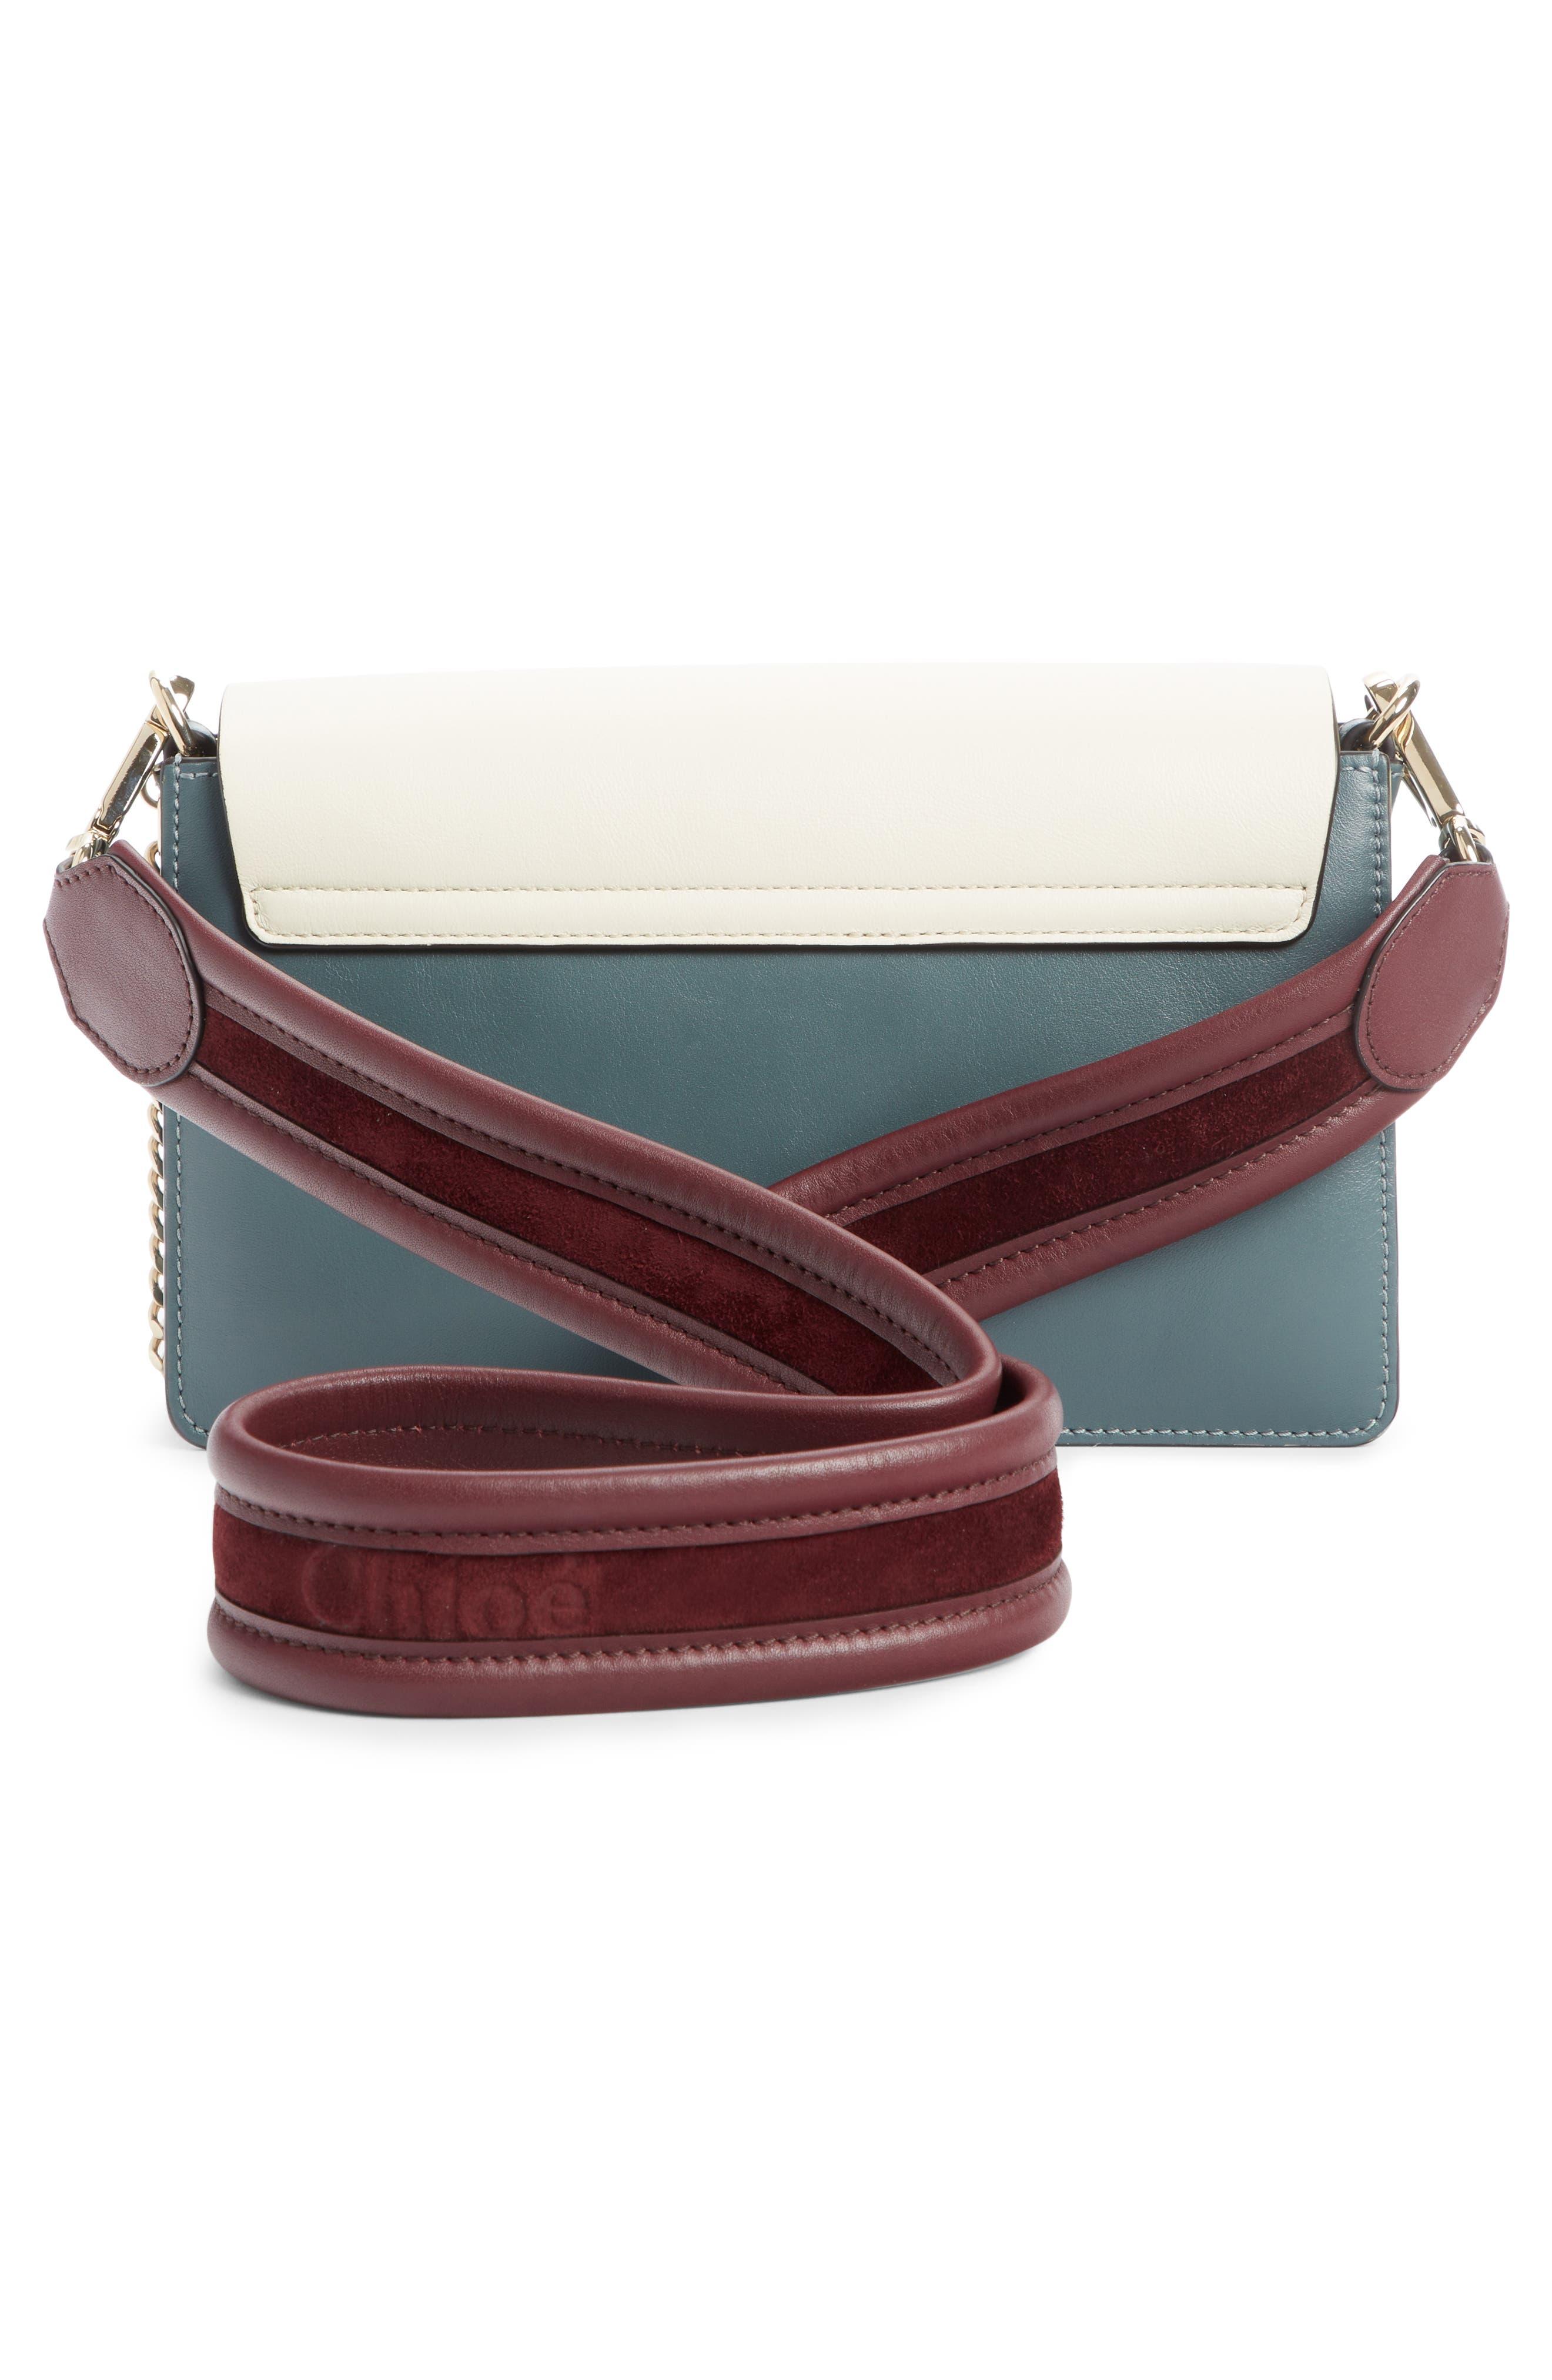 Faye Colorblock Leather Shoulder Bag,                             Alternate thumbnail 2, color,                             BLUE/ WHITE